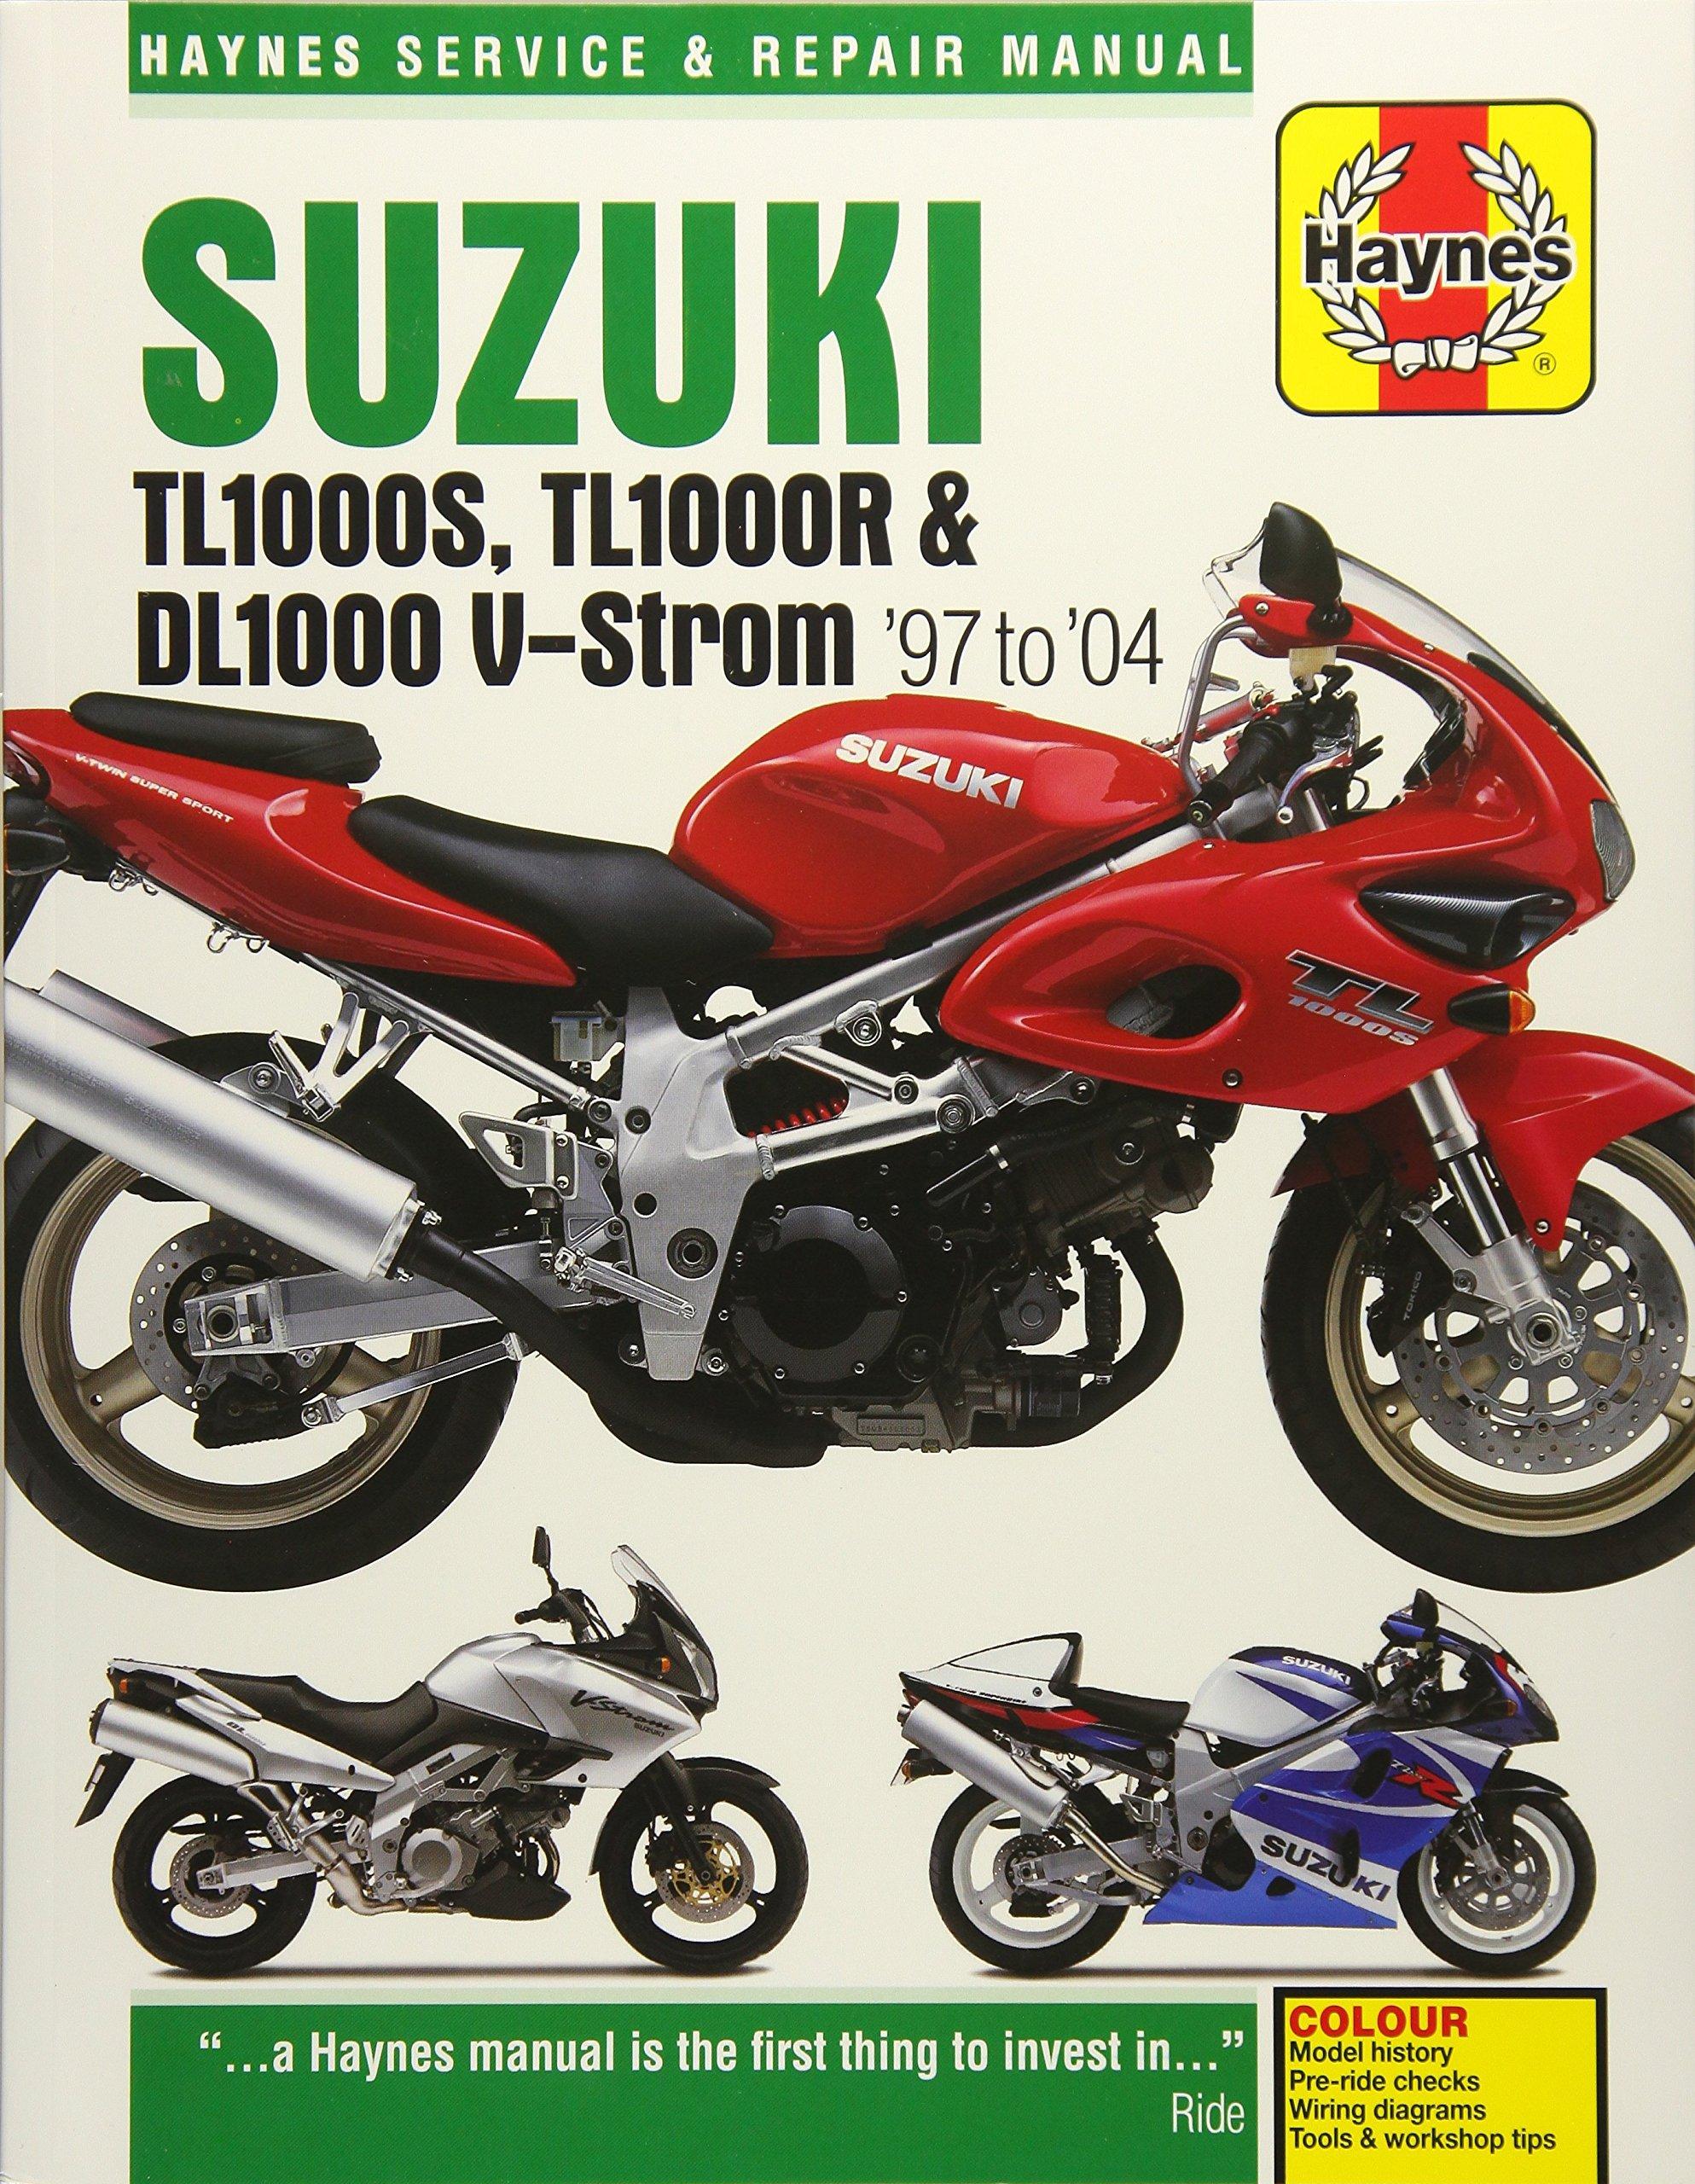 Suzuki TL1000S, TL1000R & DL1000 V-Strom '97 to '04 (Haynes Service &  Repair Manual): Matthew Coombs: 9781785213120: Amazon.com: Books